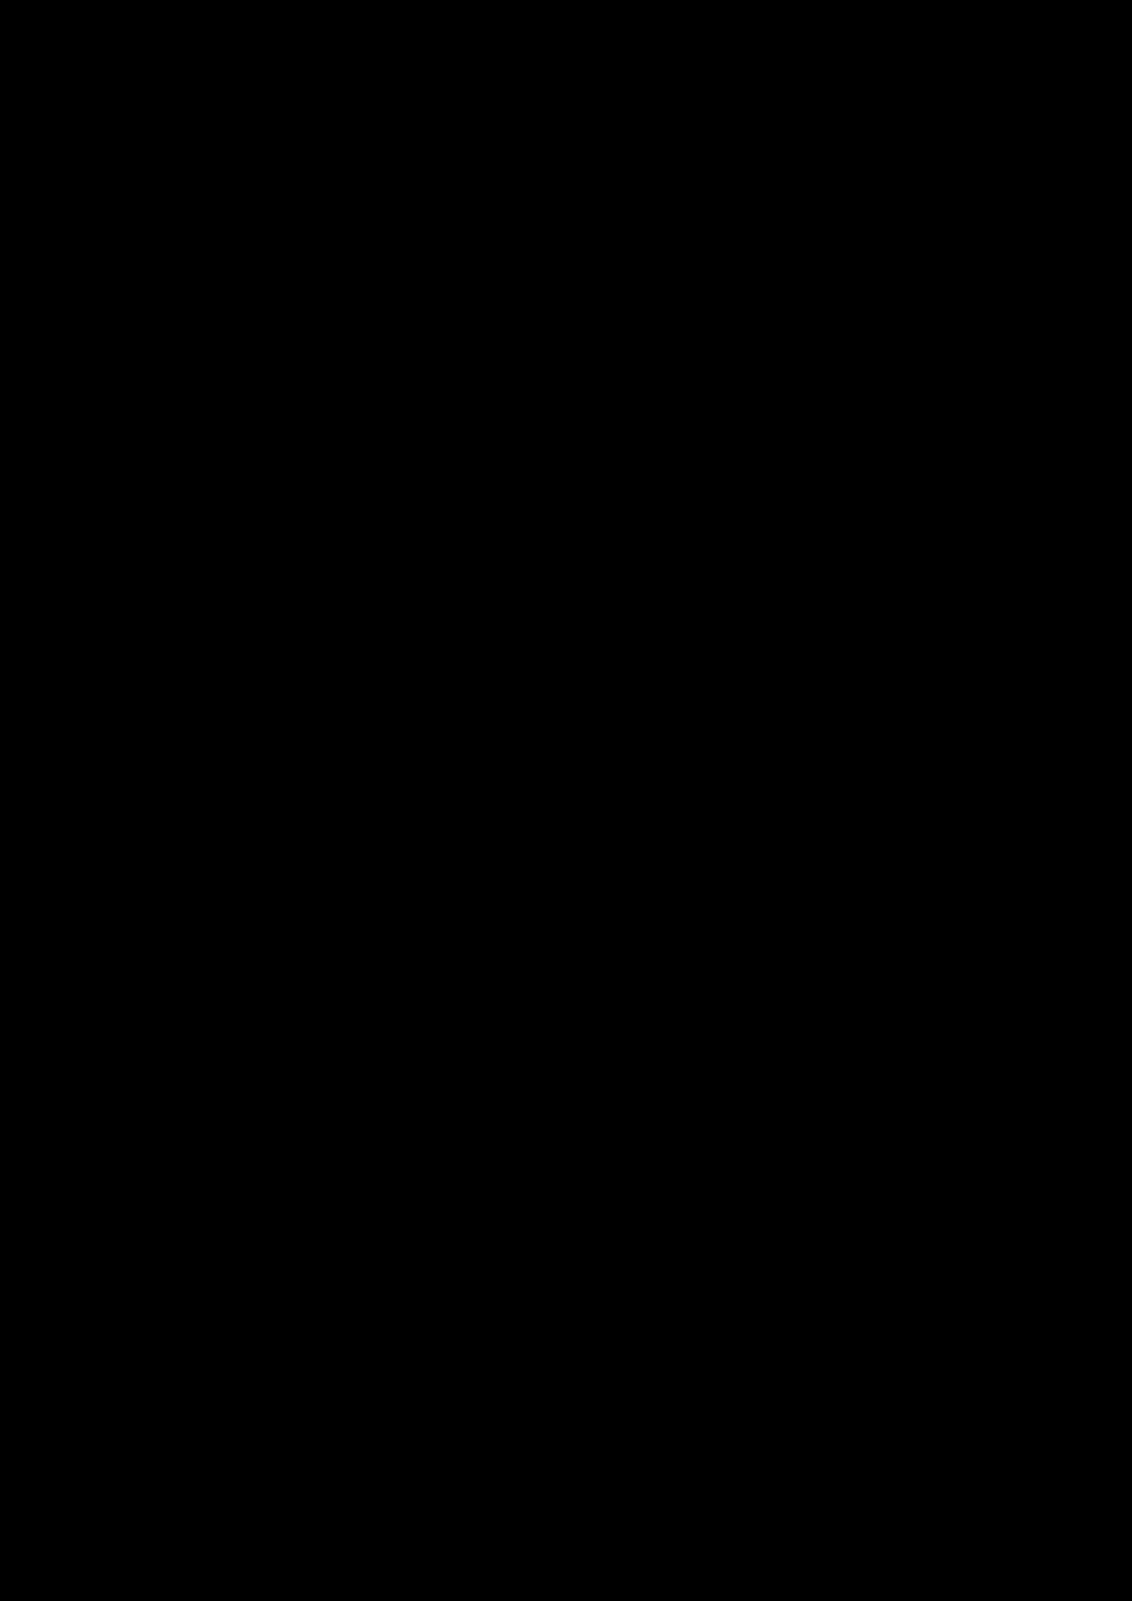 Mrs. Vandebilt slide, Image 18